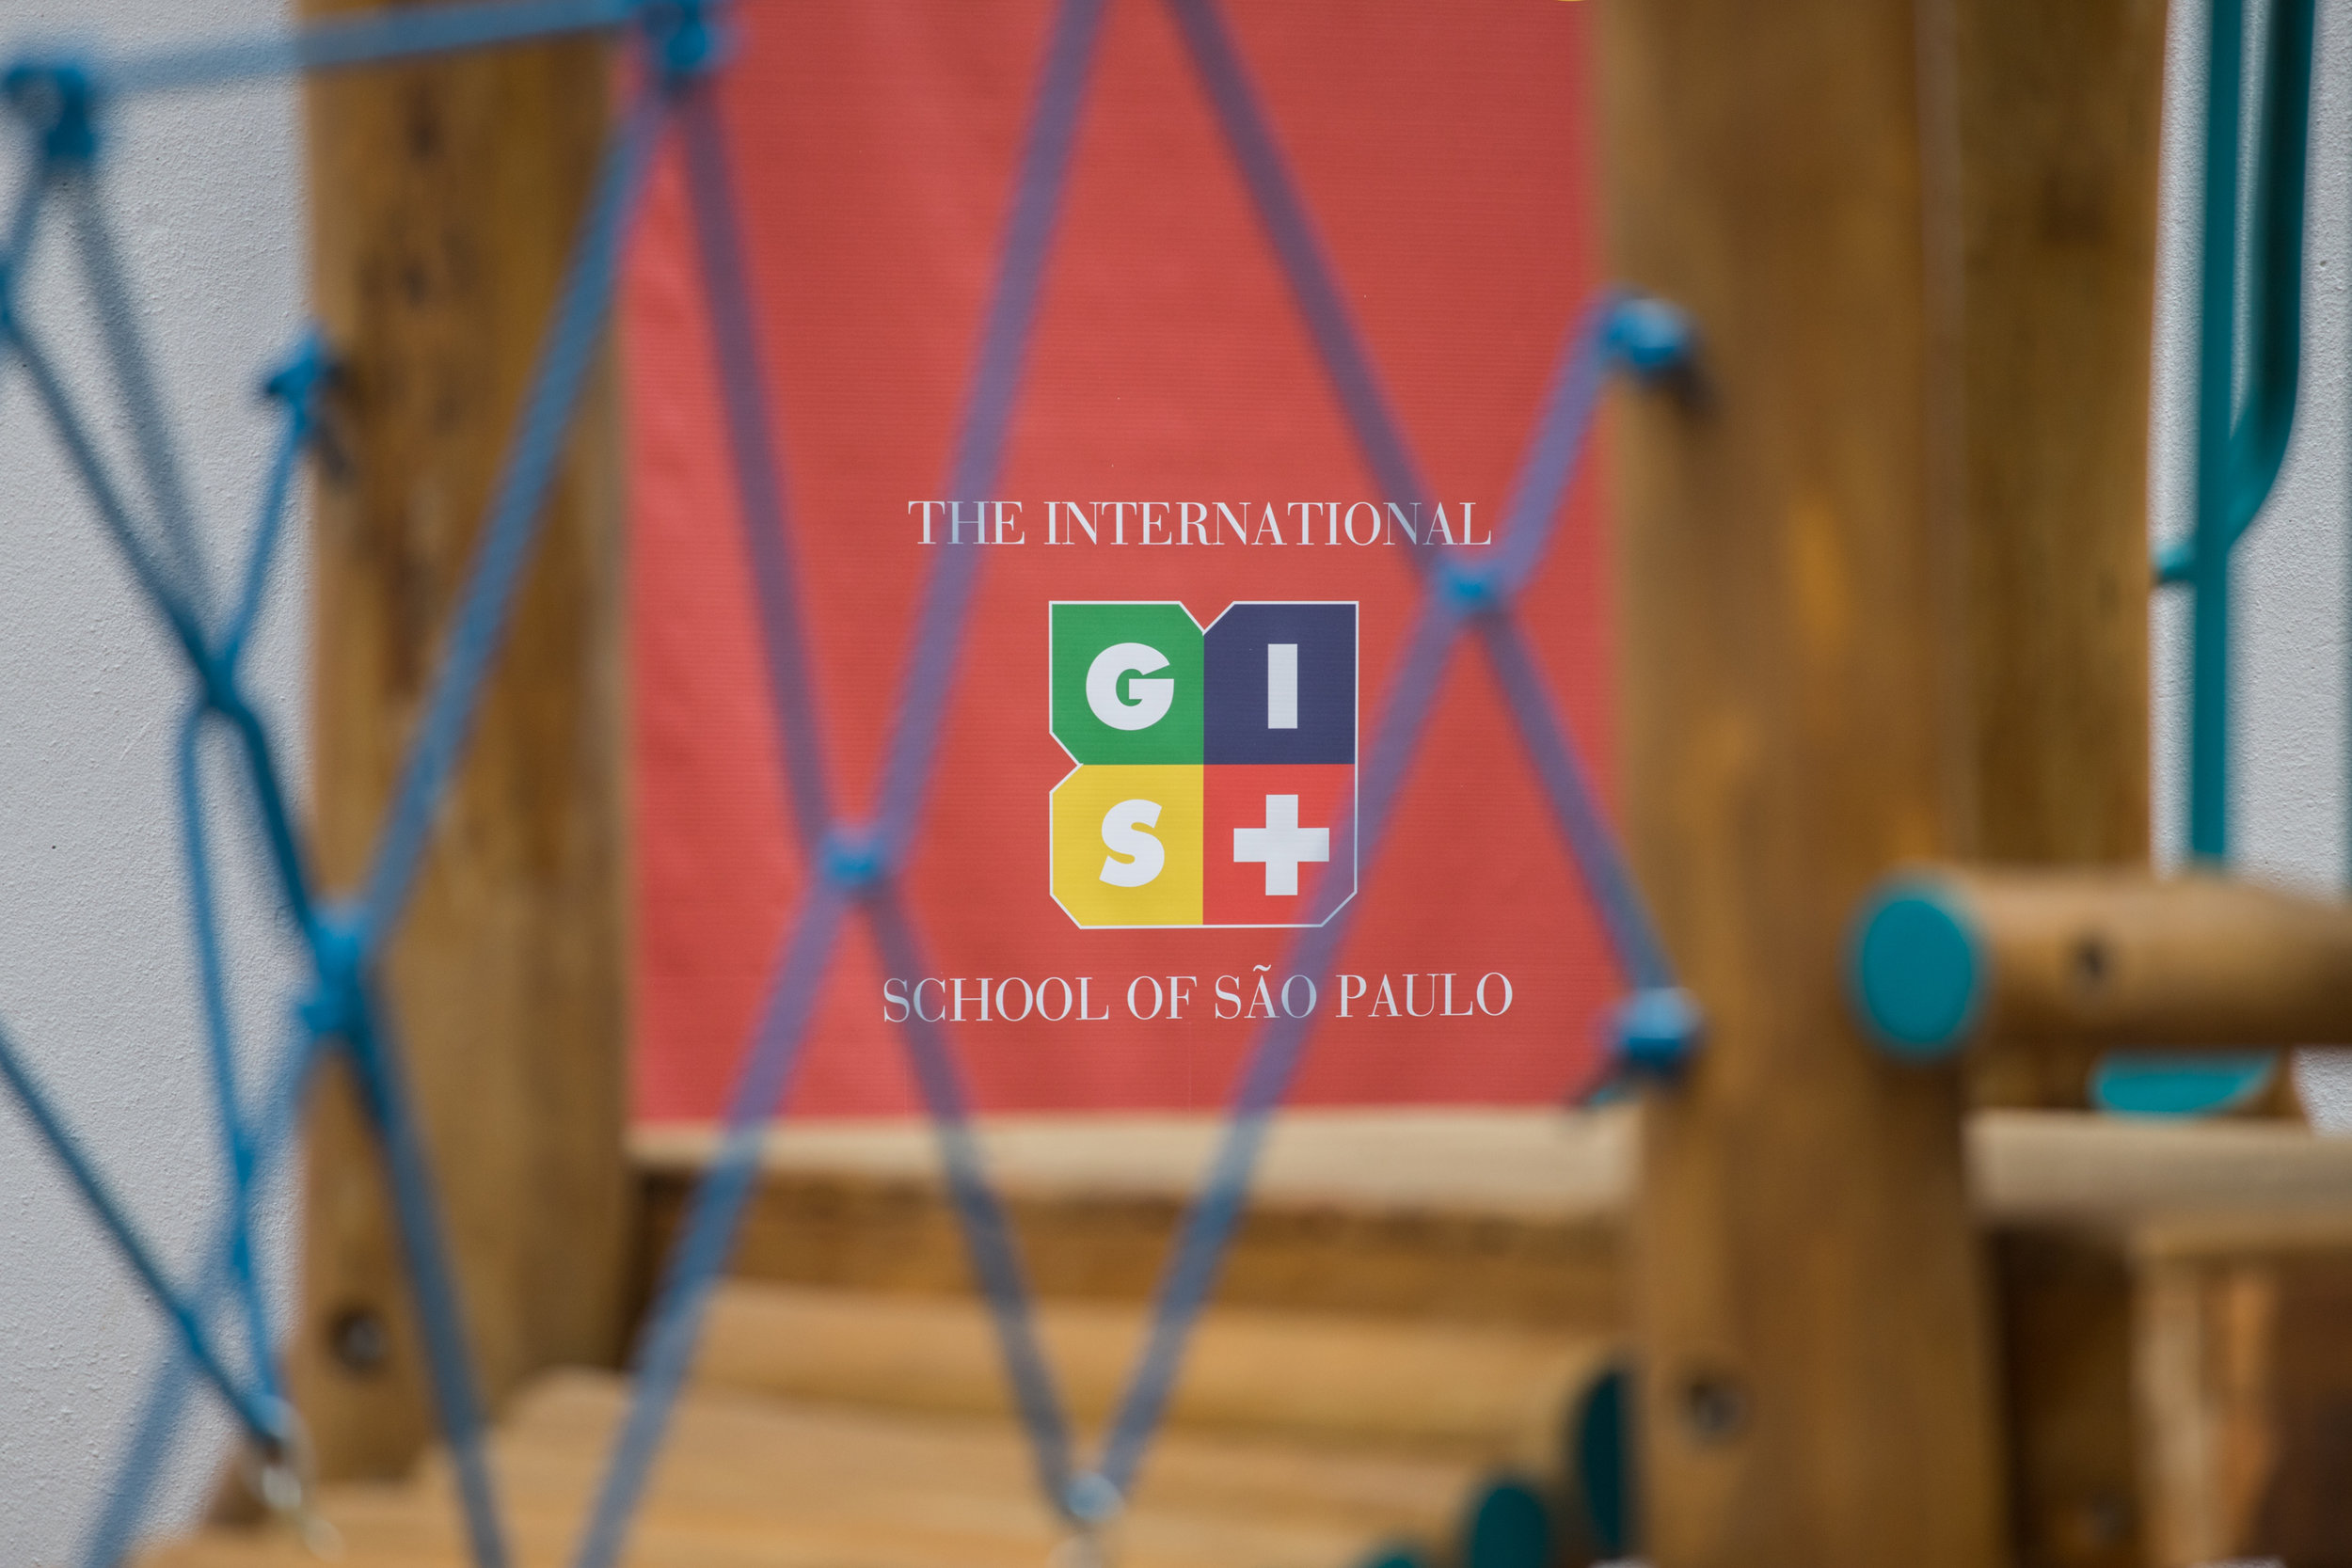 FOTOS - THE INTERNATIONAL SCHOOL OF SÃO PAULO 66.jpg